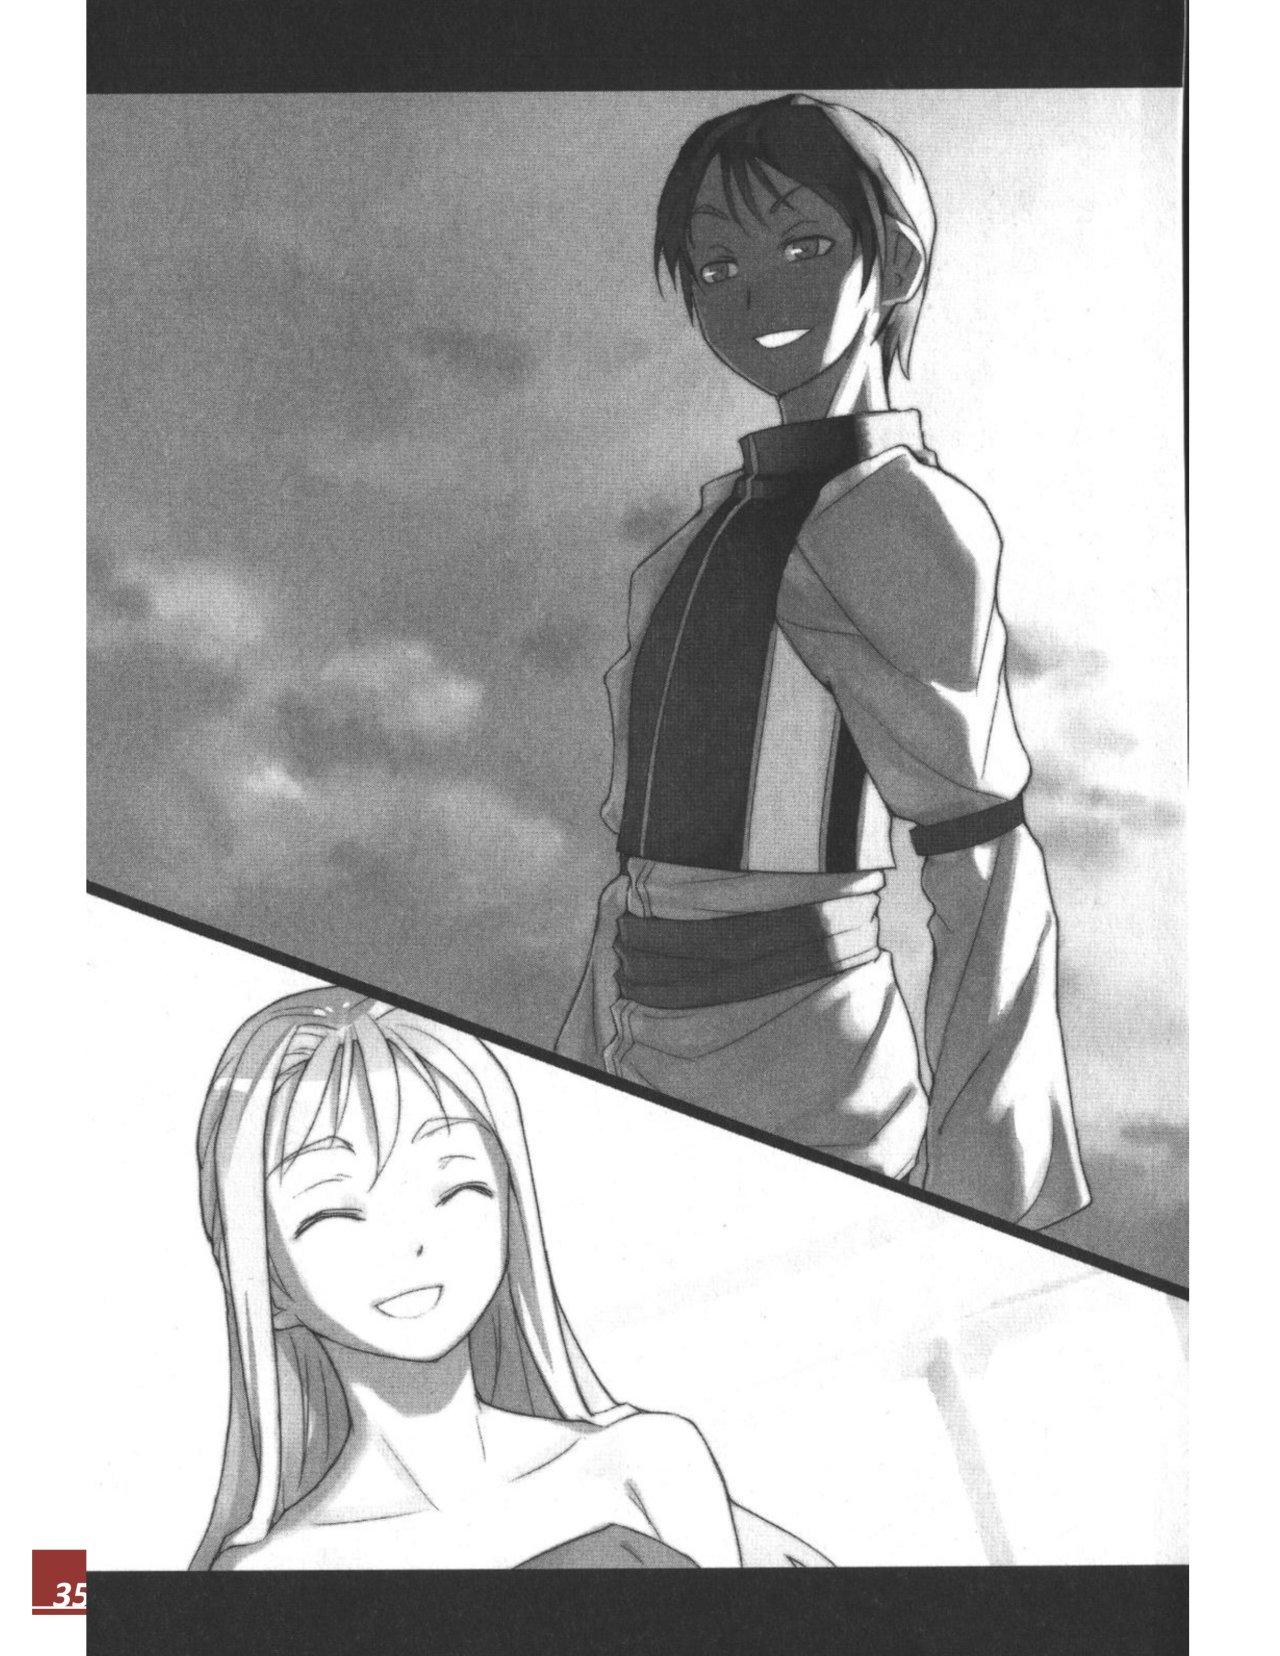 https://c10.mangatag.com/es_manga/pic5/22/25558/782961/9dd50221016e7524a7882e5ec3913d56.jpg Page 35